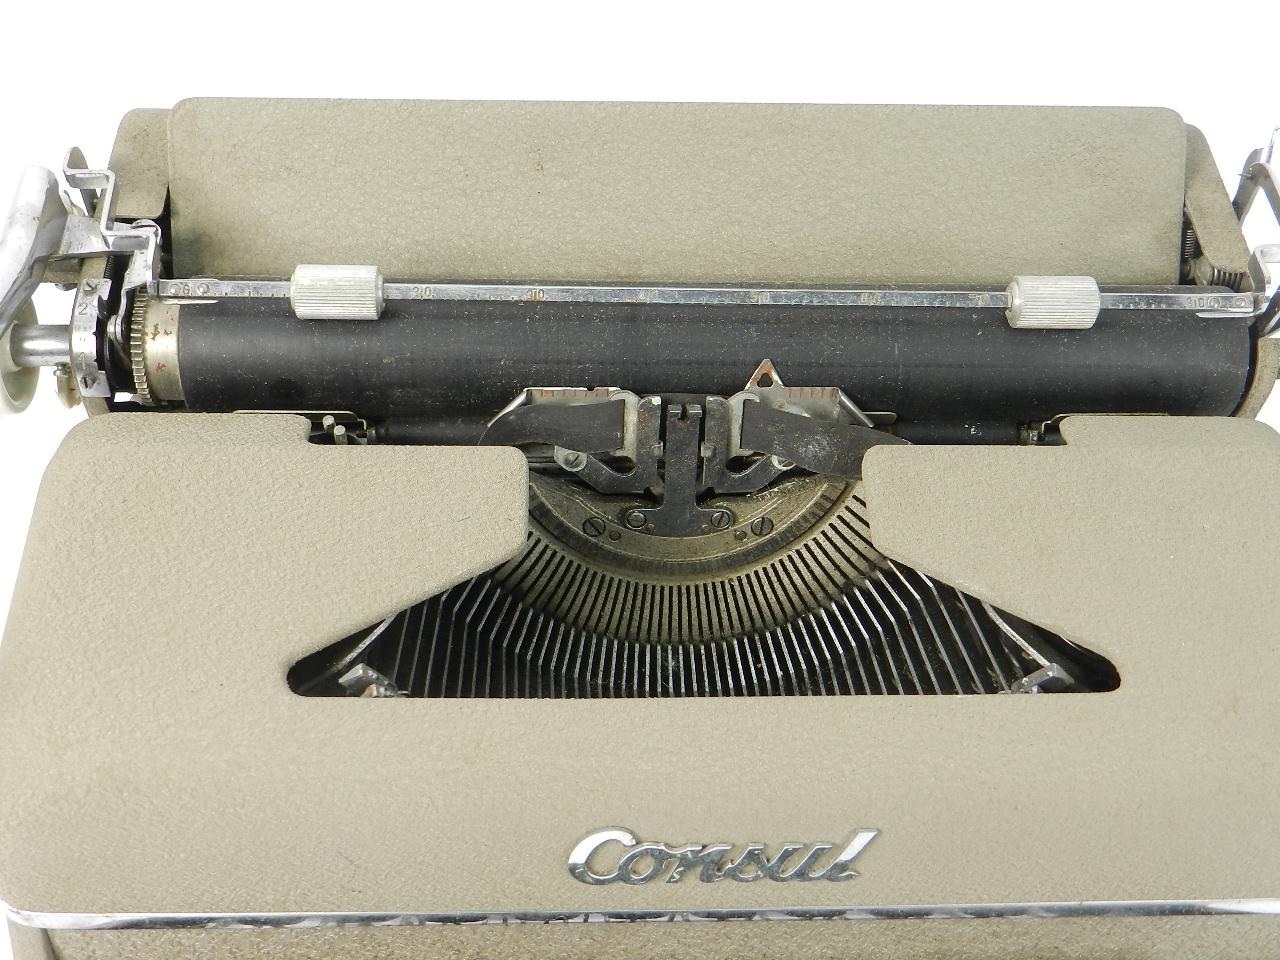 Imagen CONSUL AÑO 1955 38232